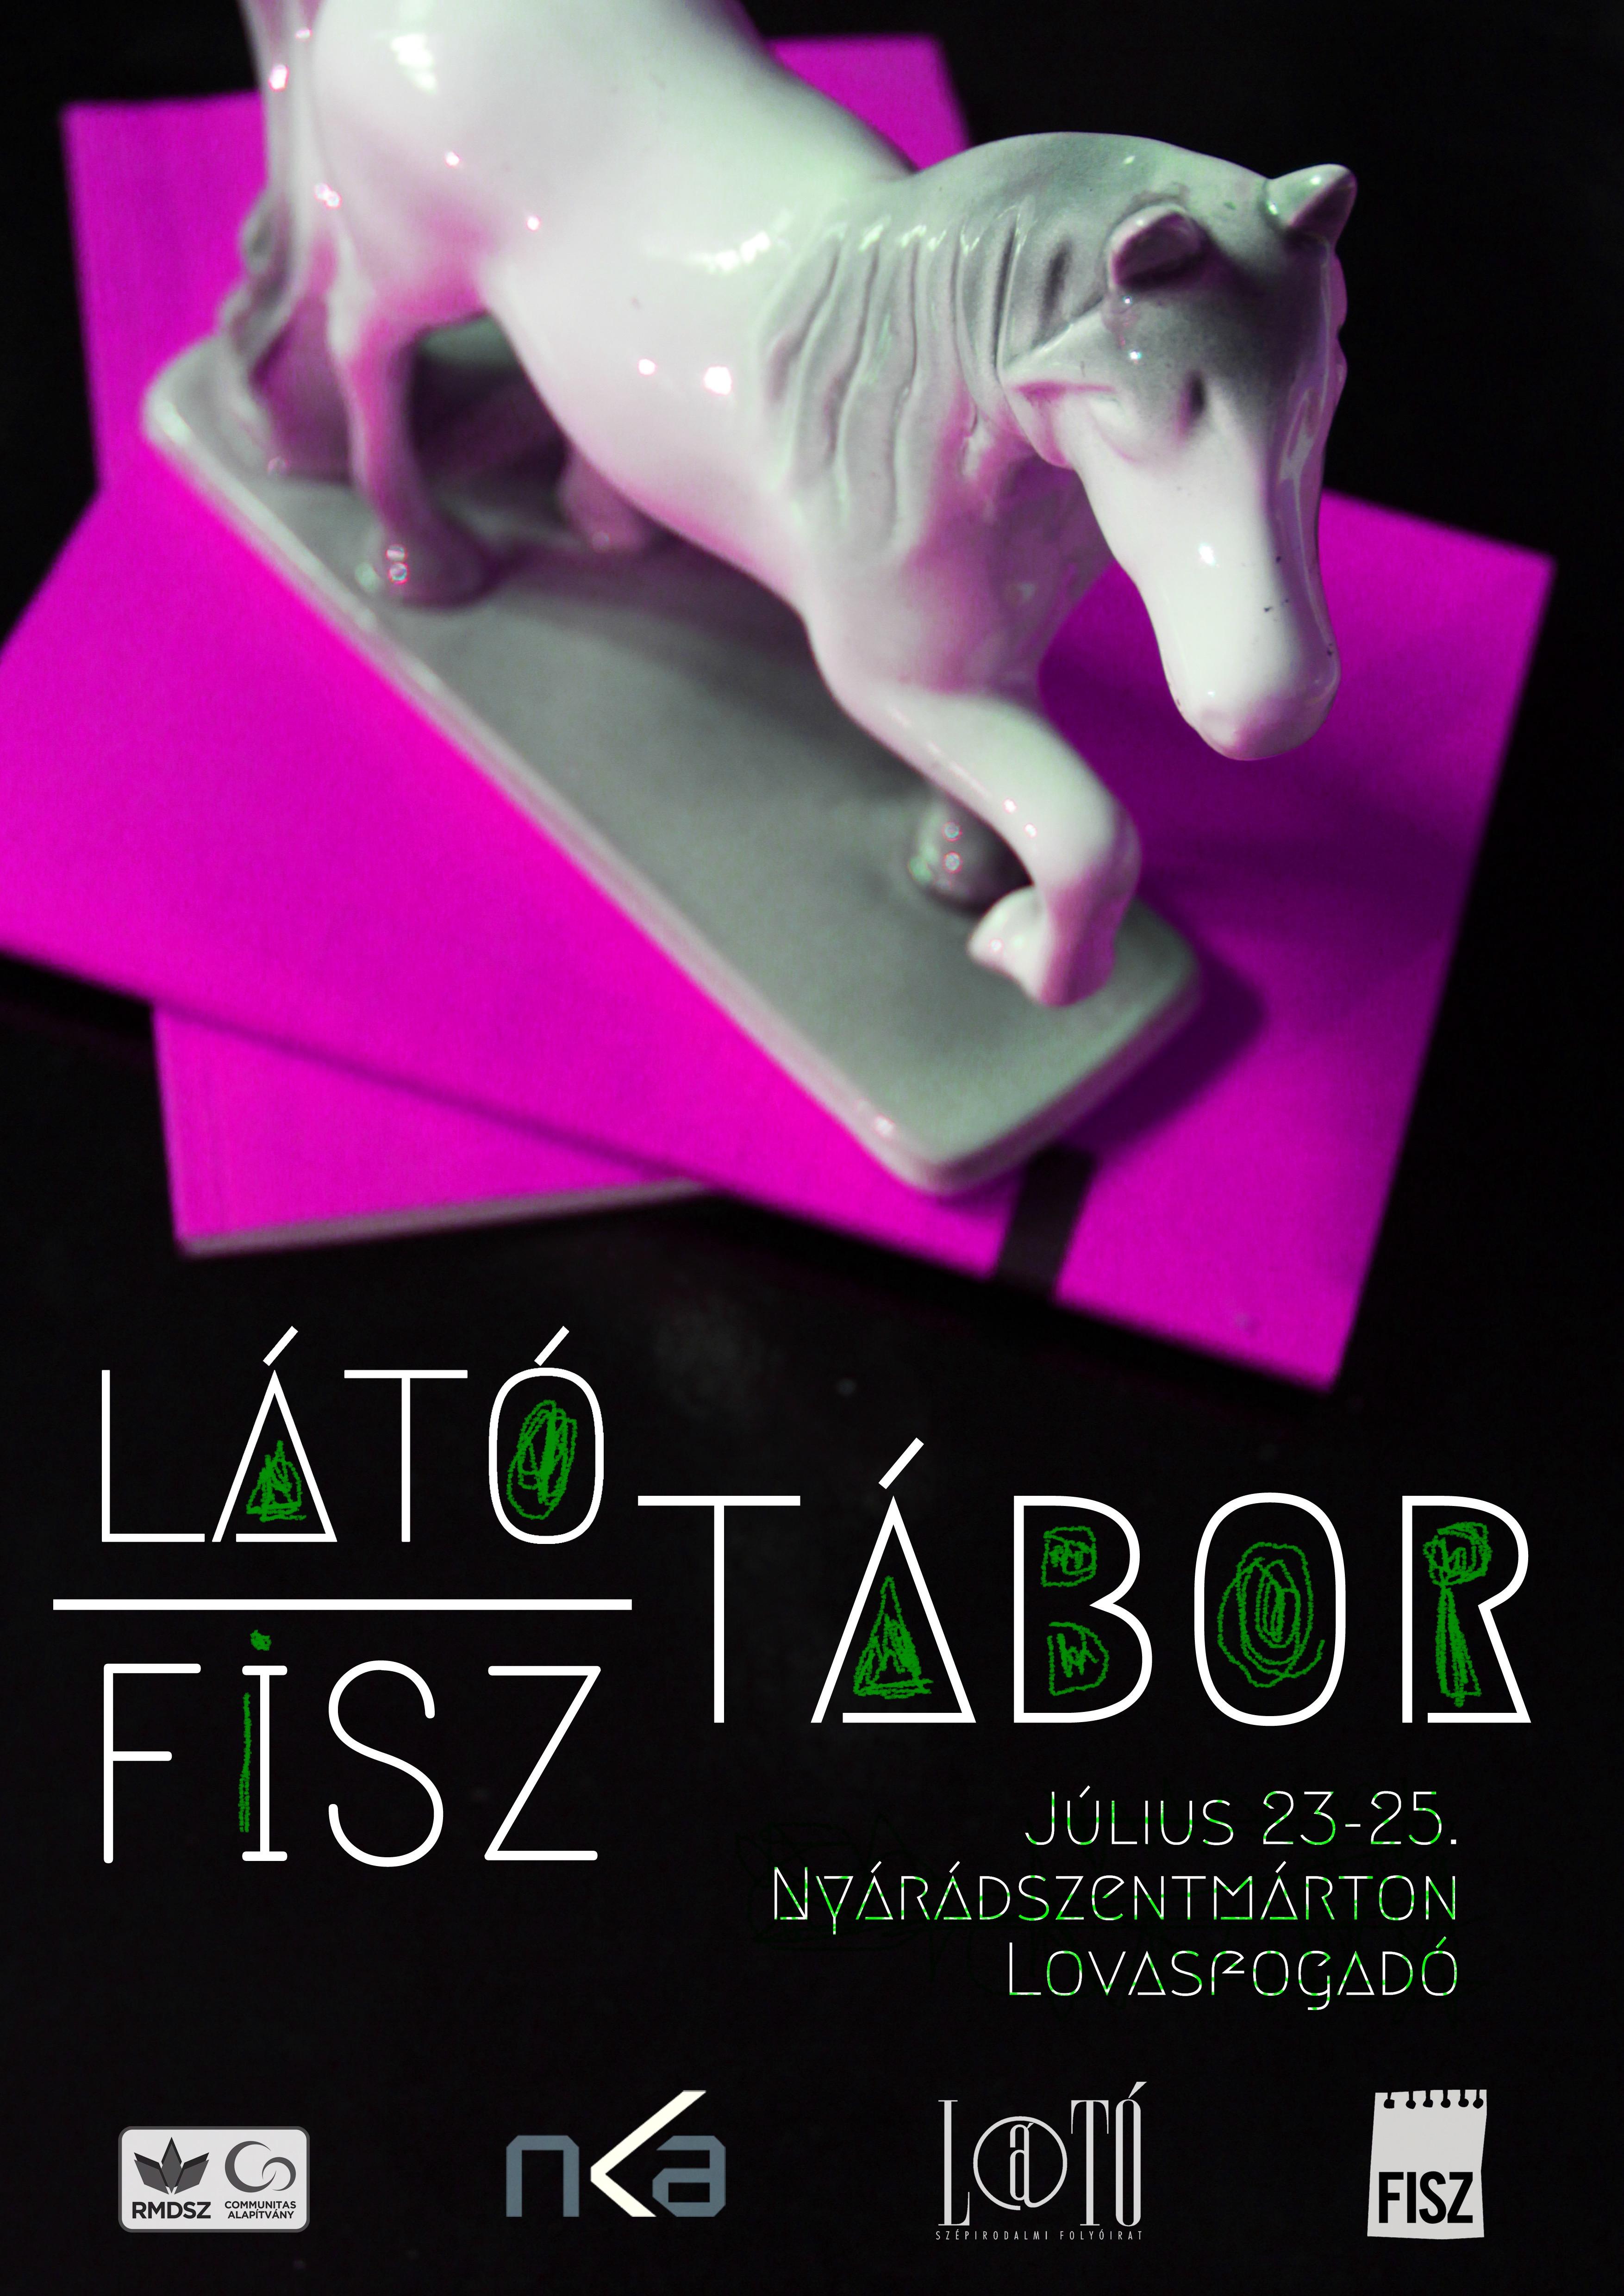 lato_fisz_tabor5-2.jpg